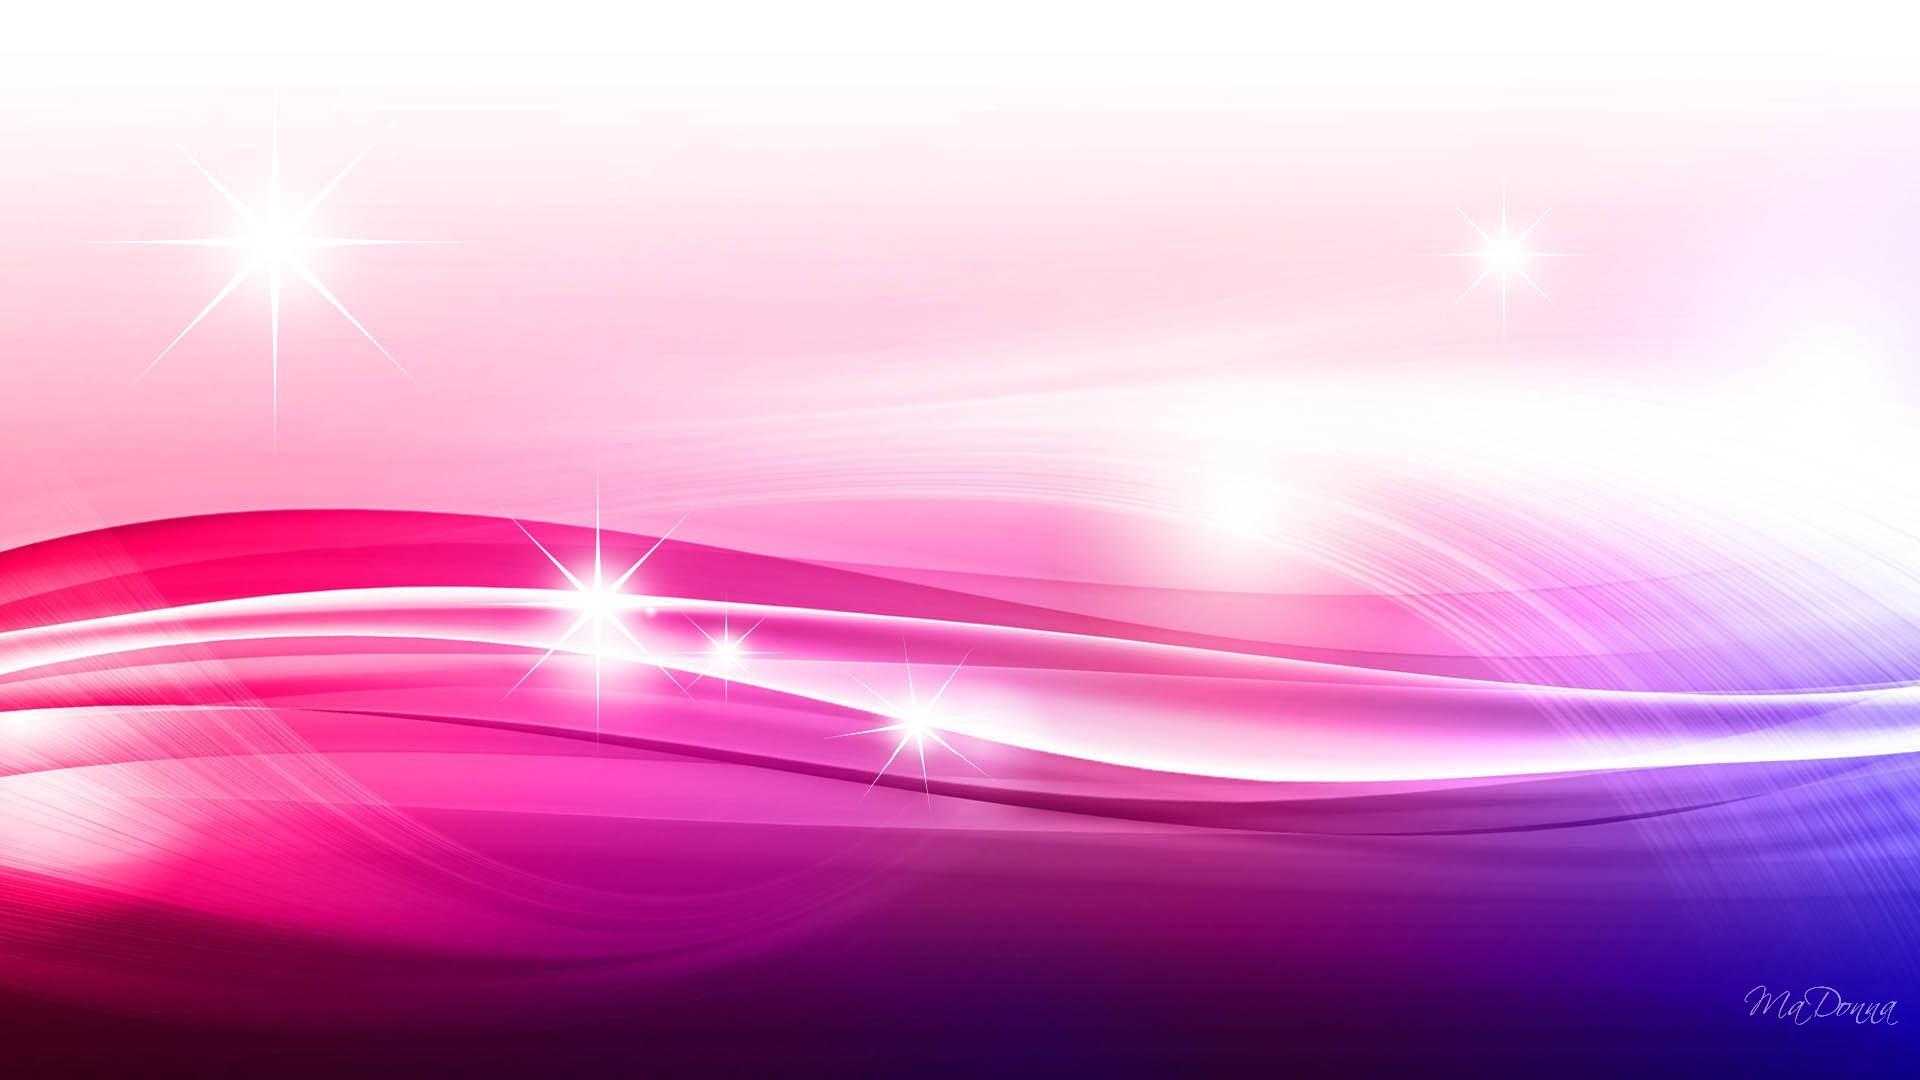 Stars Sparkle Swish Pink Backgrounds for Presentation – PPT Backgrounds  Templates